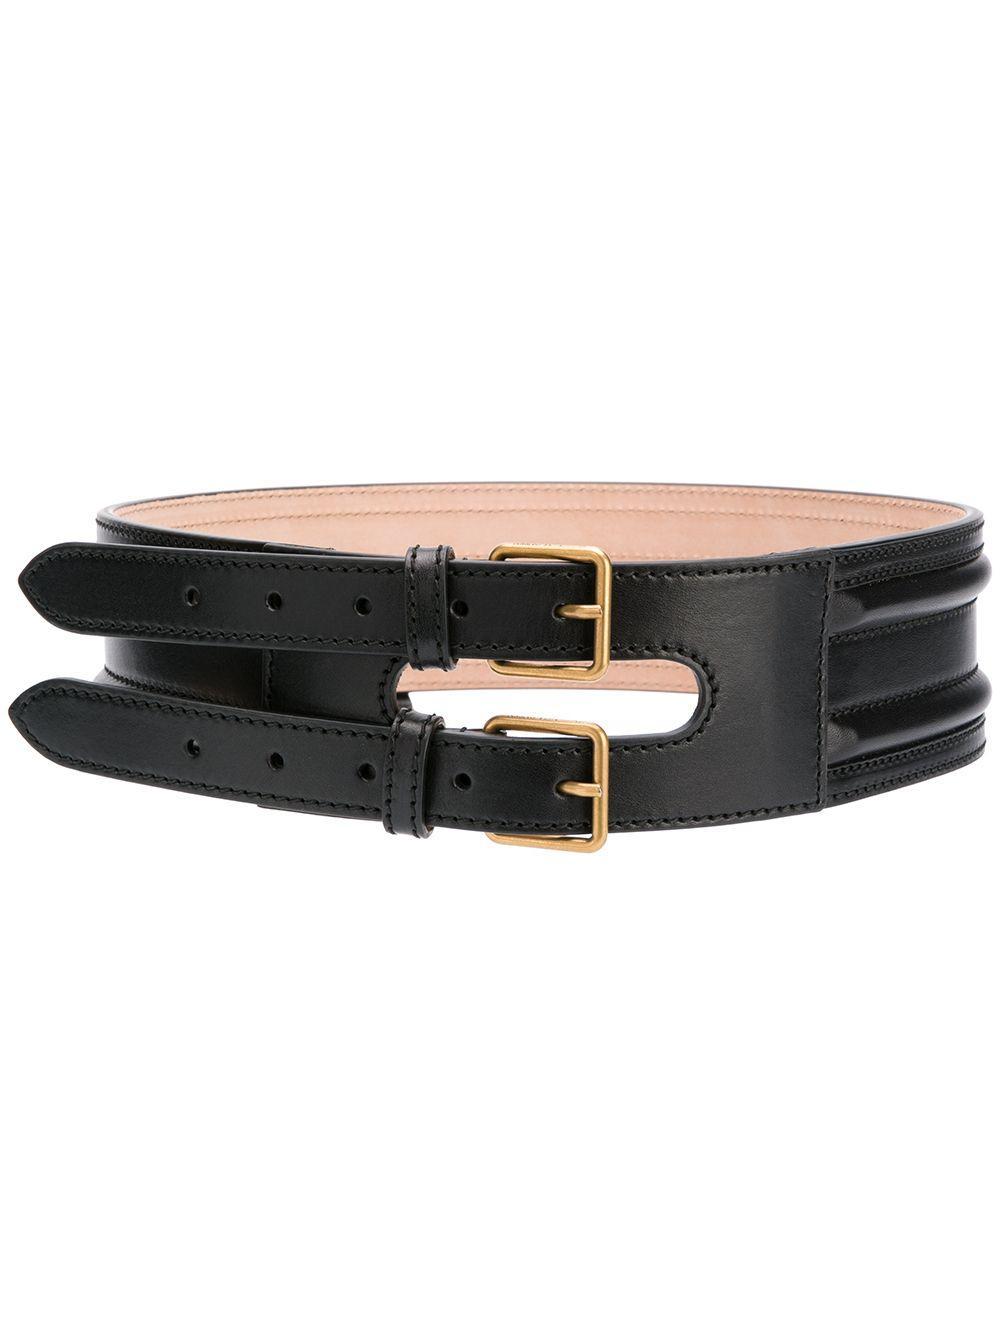 Double Buckle Belt Item # 6105451BR00